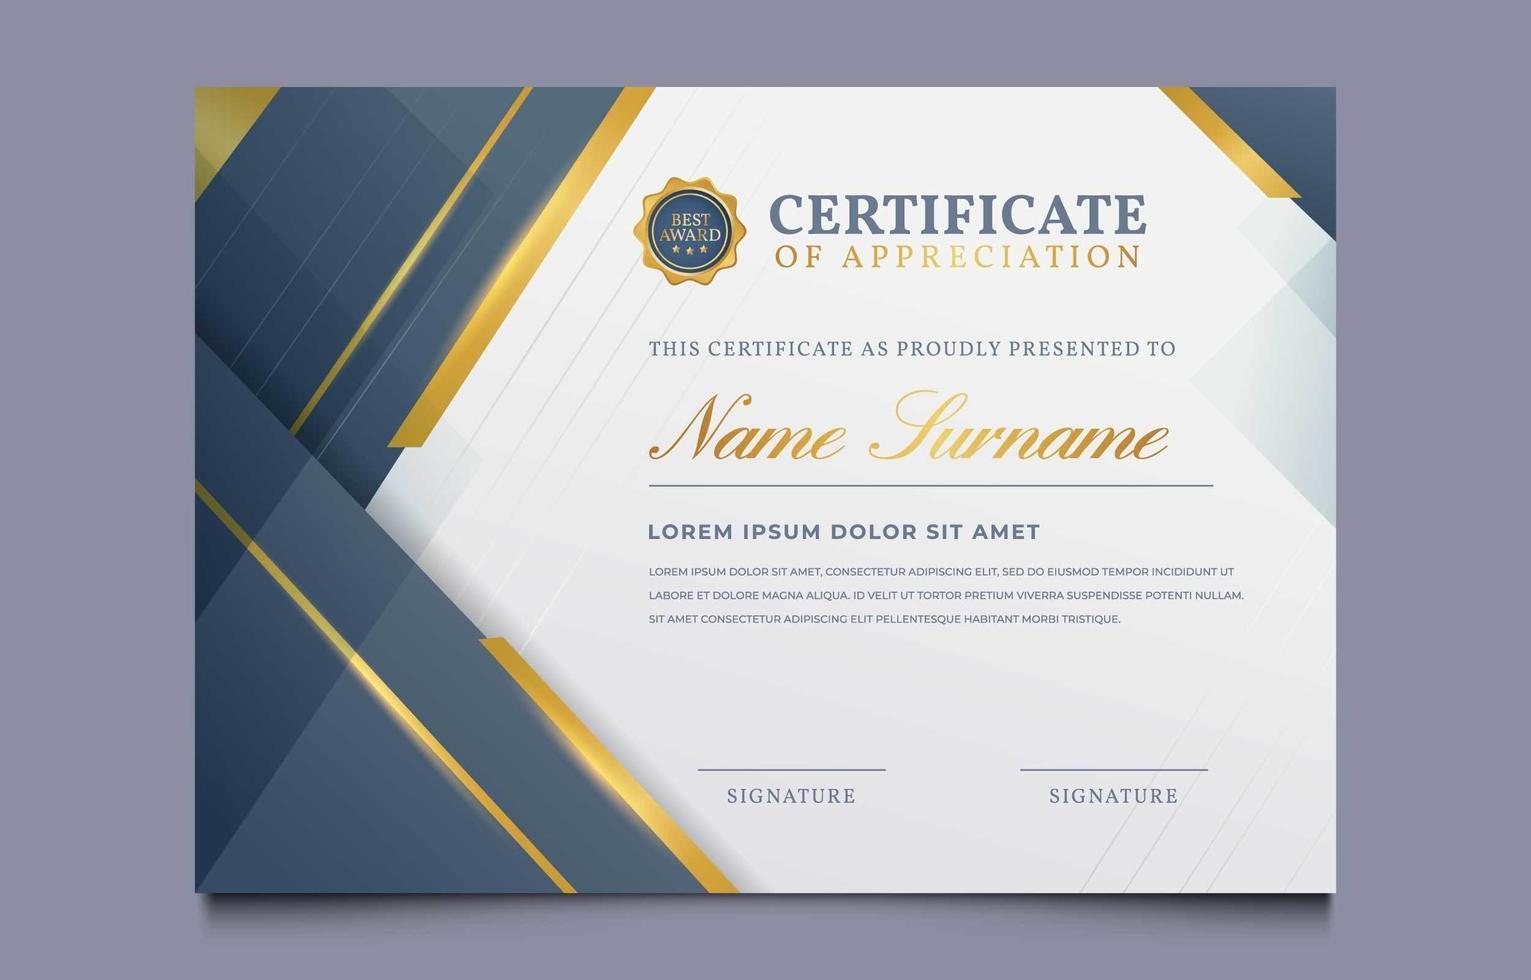 Certificate of Appreciation Template 23 Vector Art at Vecteezy Throughout Certificates Of Appreciation Template